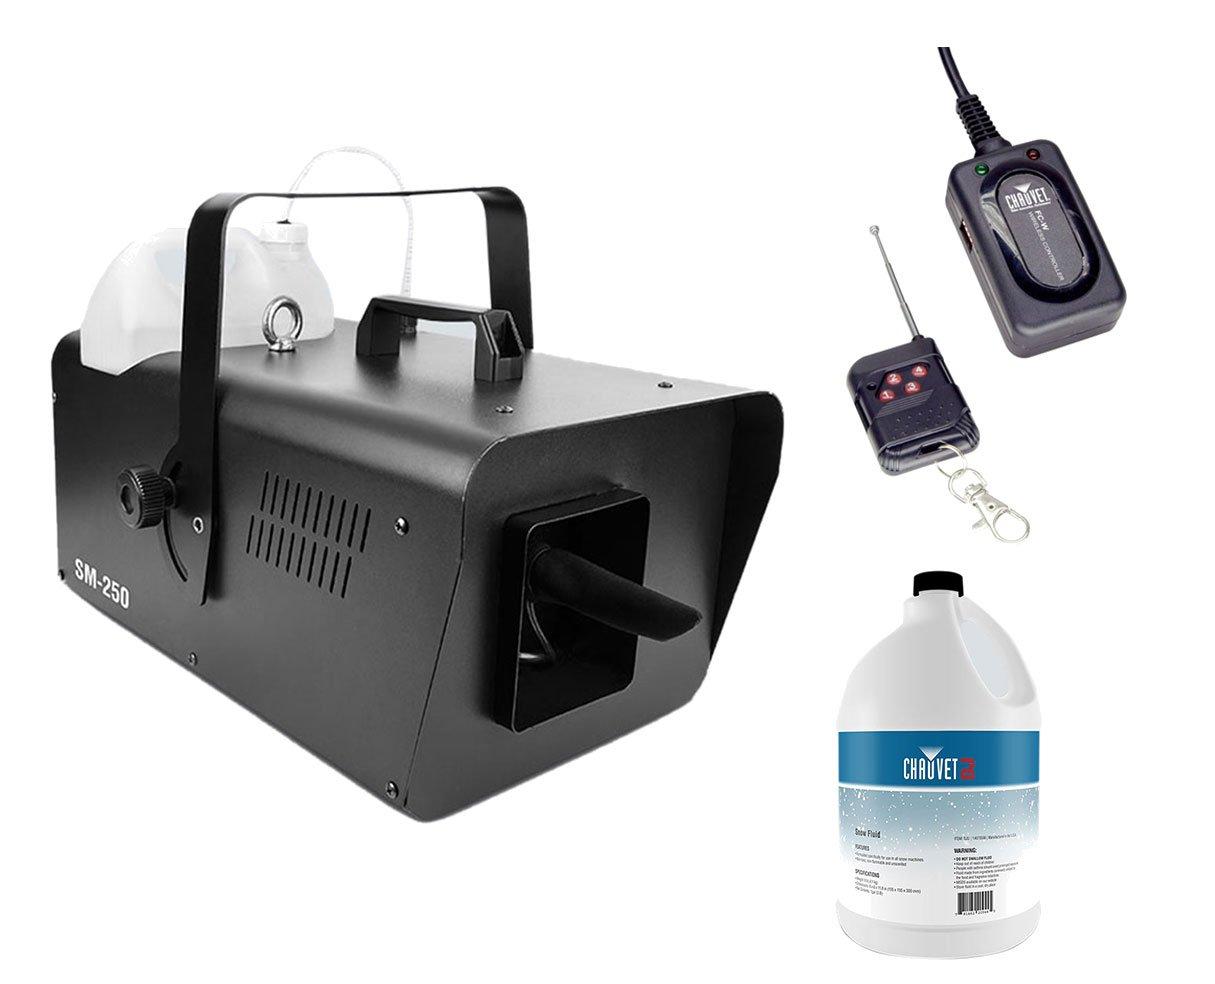 Chauvet SM-250 SM250 Snow Machine + FC-W Wireless Remote + Snow Fluid Gallon